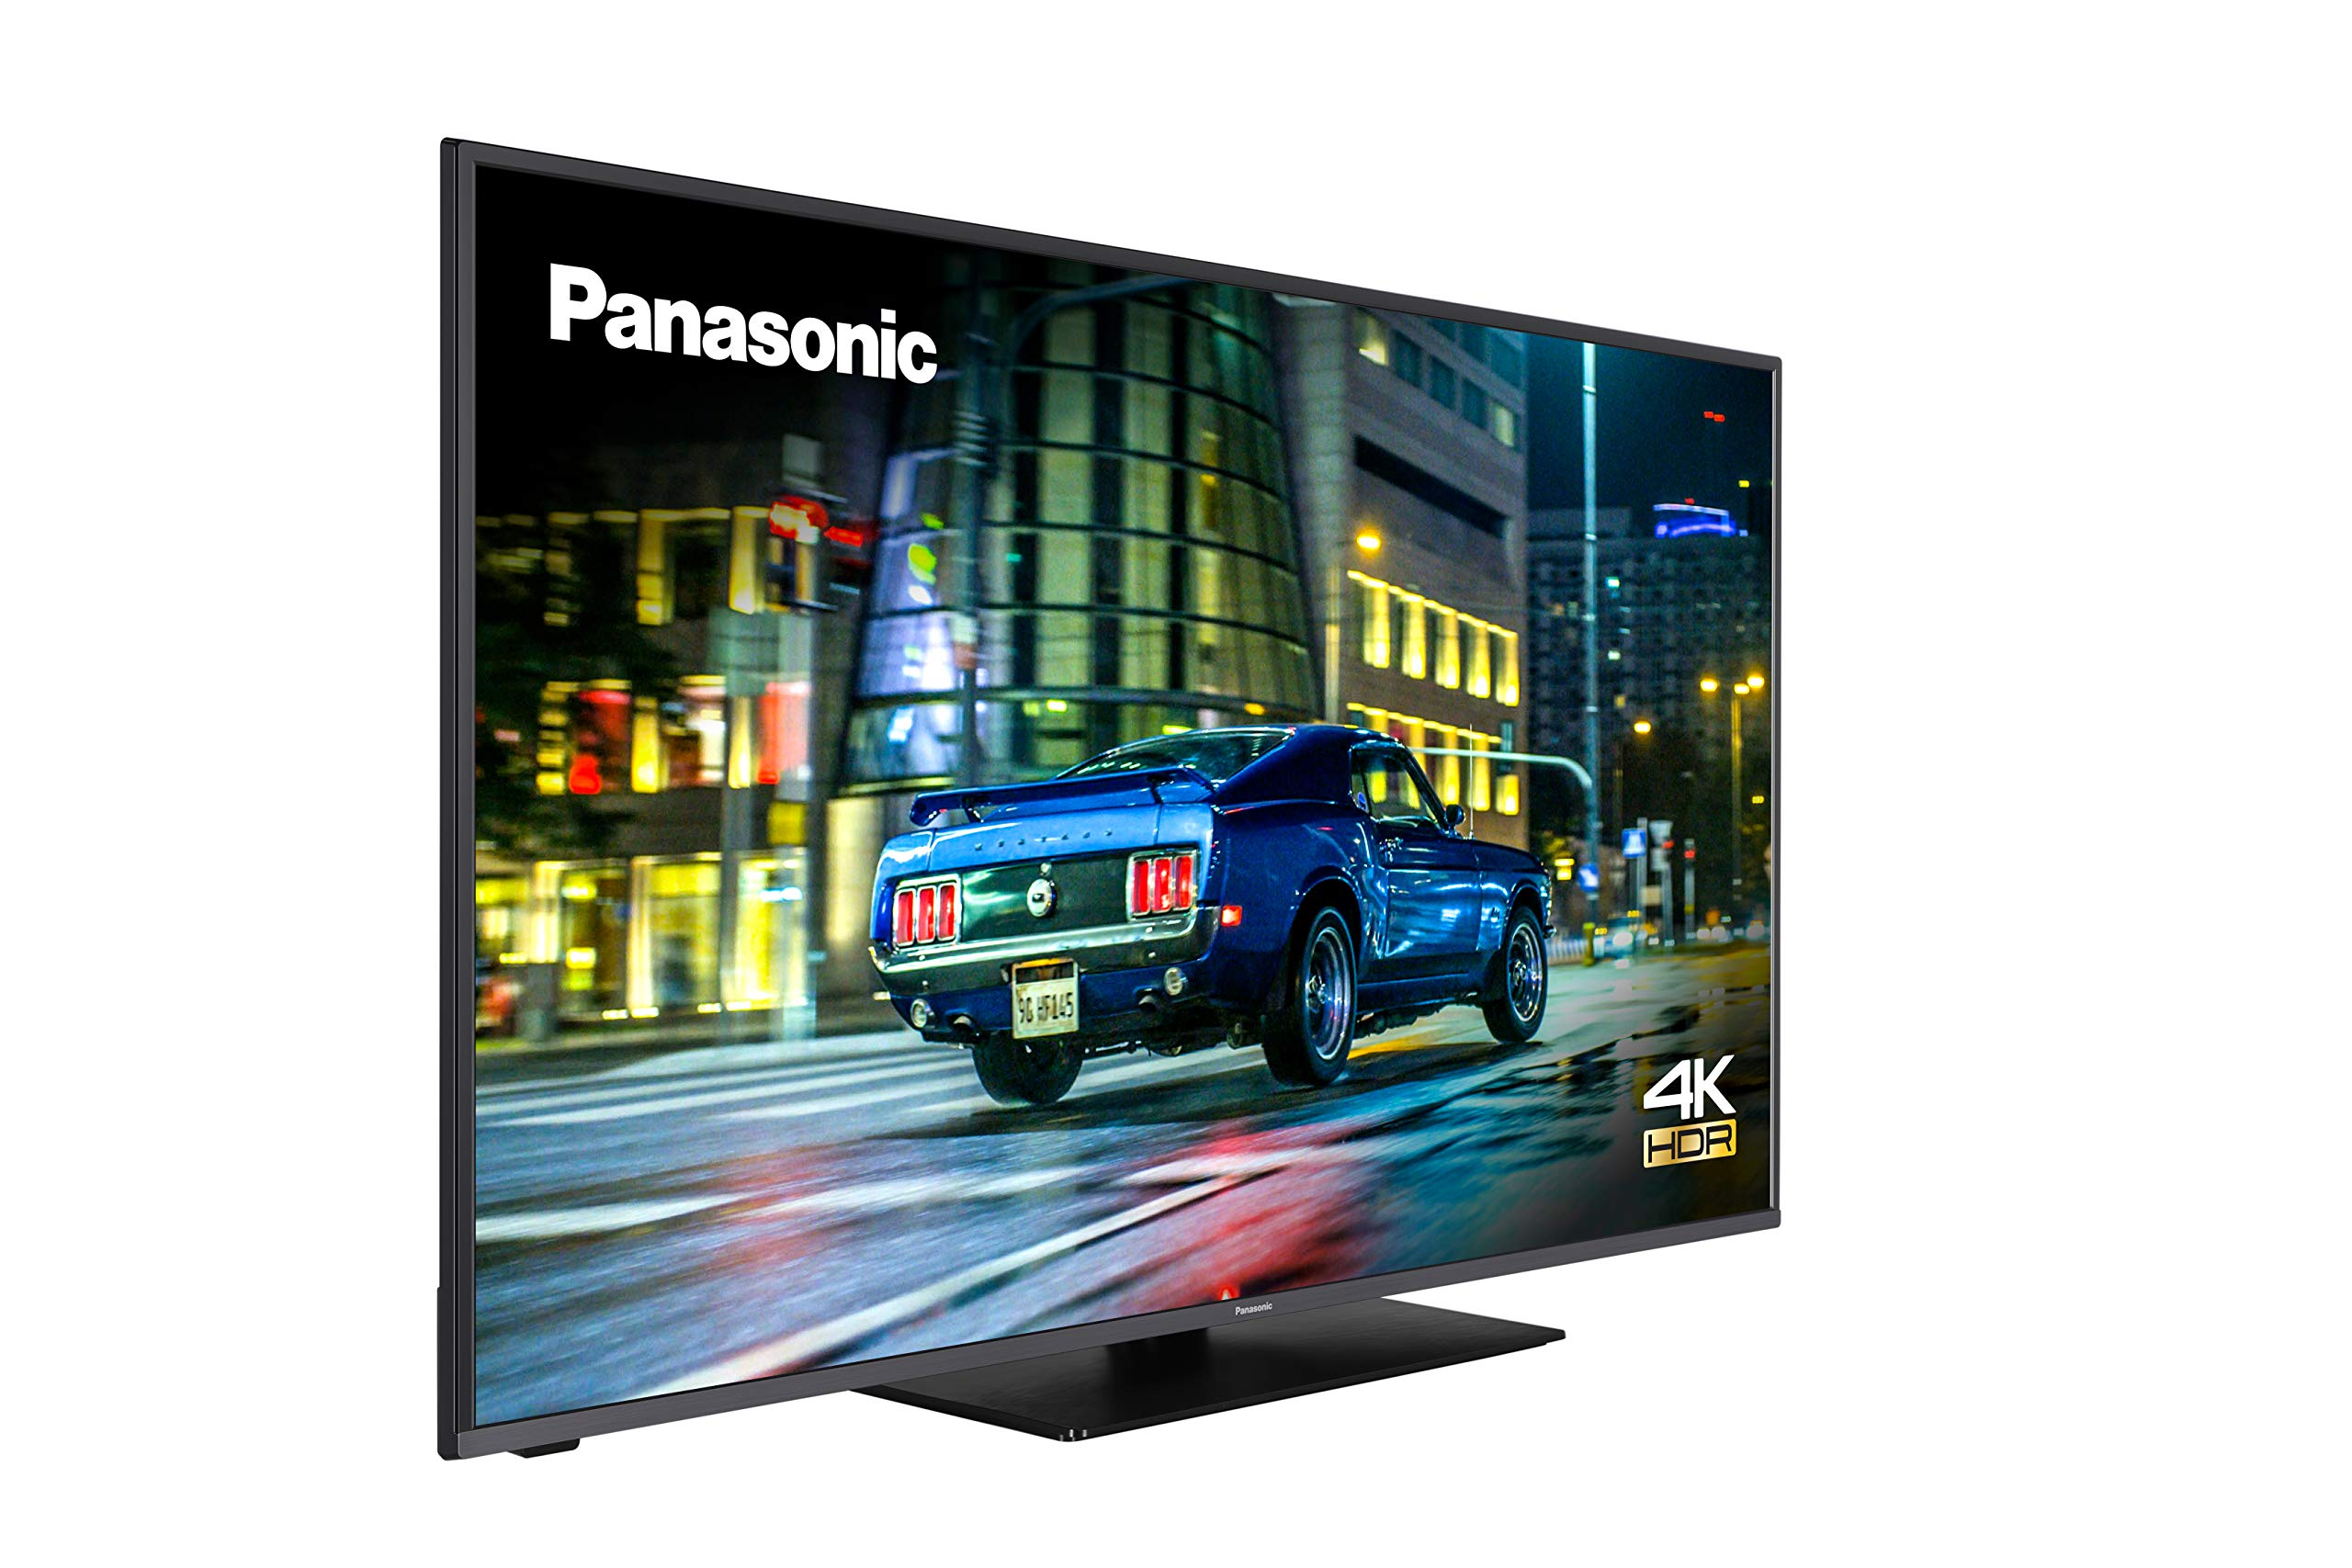 Panasonic 2020 50 inch HX580BZ 4K LED HDR Smart TV Dolby Vision/Atmos